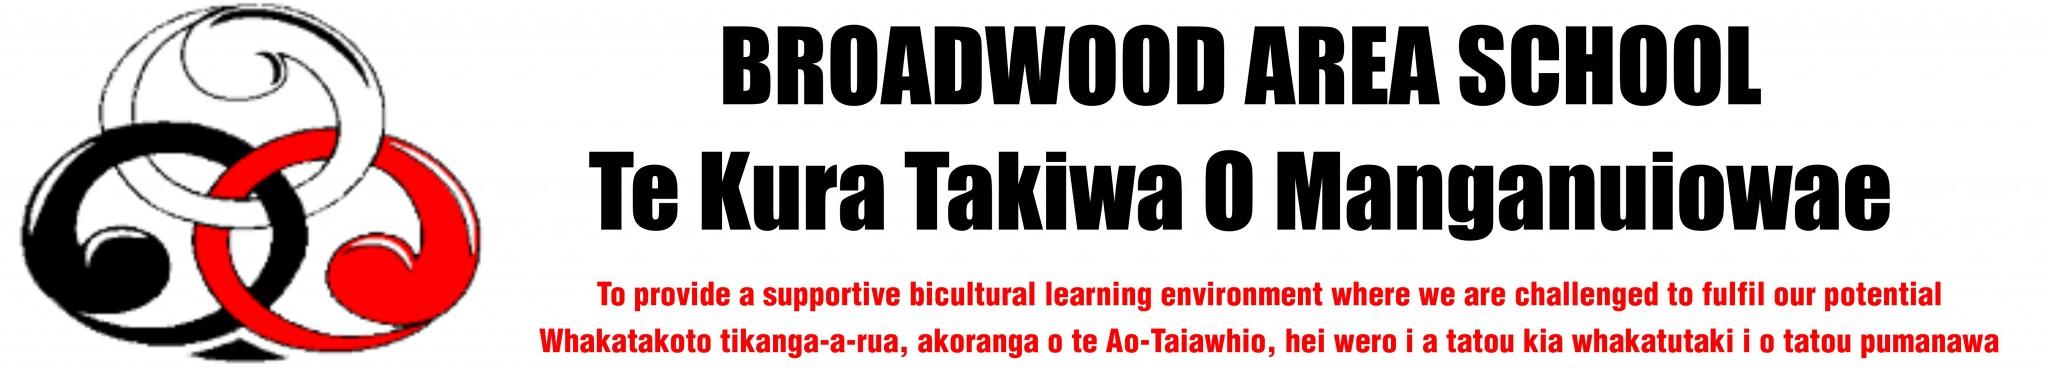 Broadwood Area School Logo